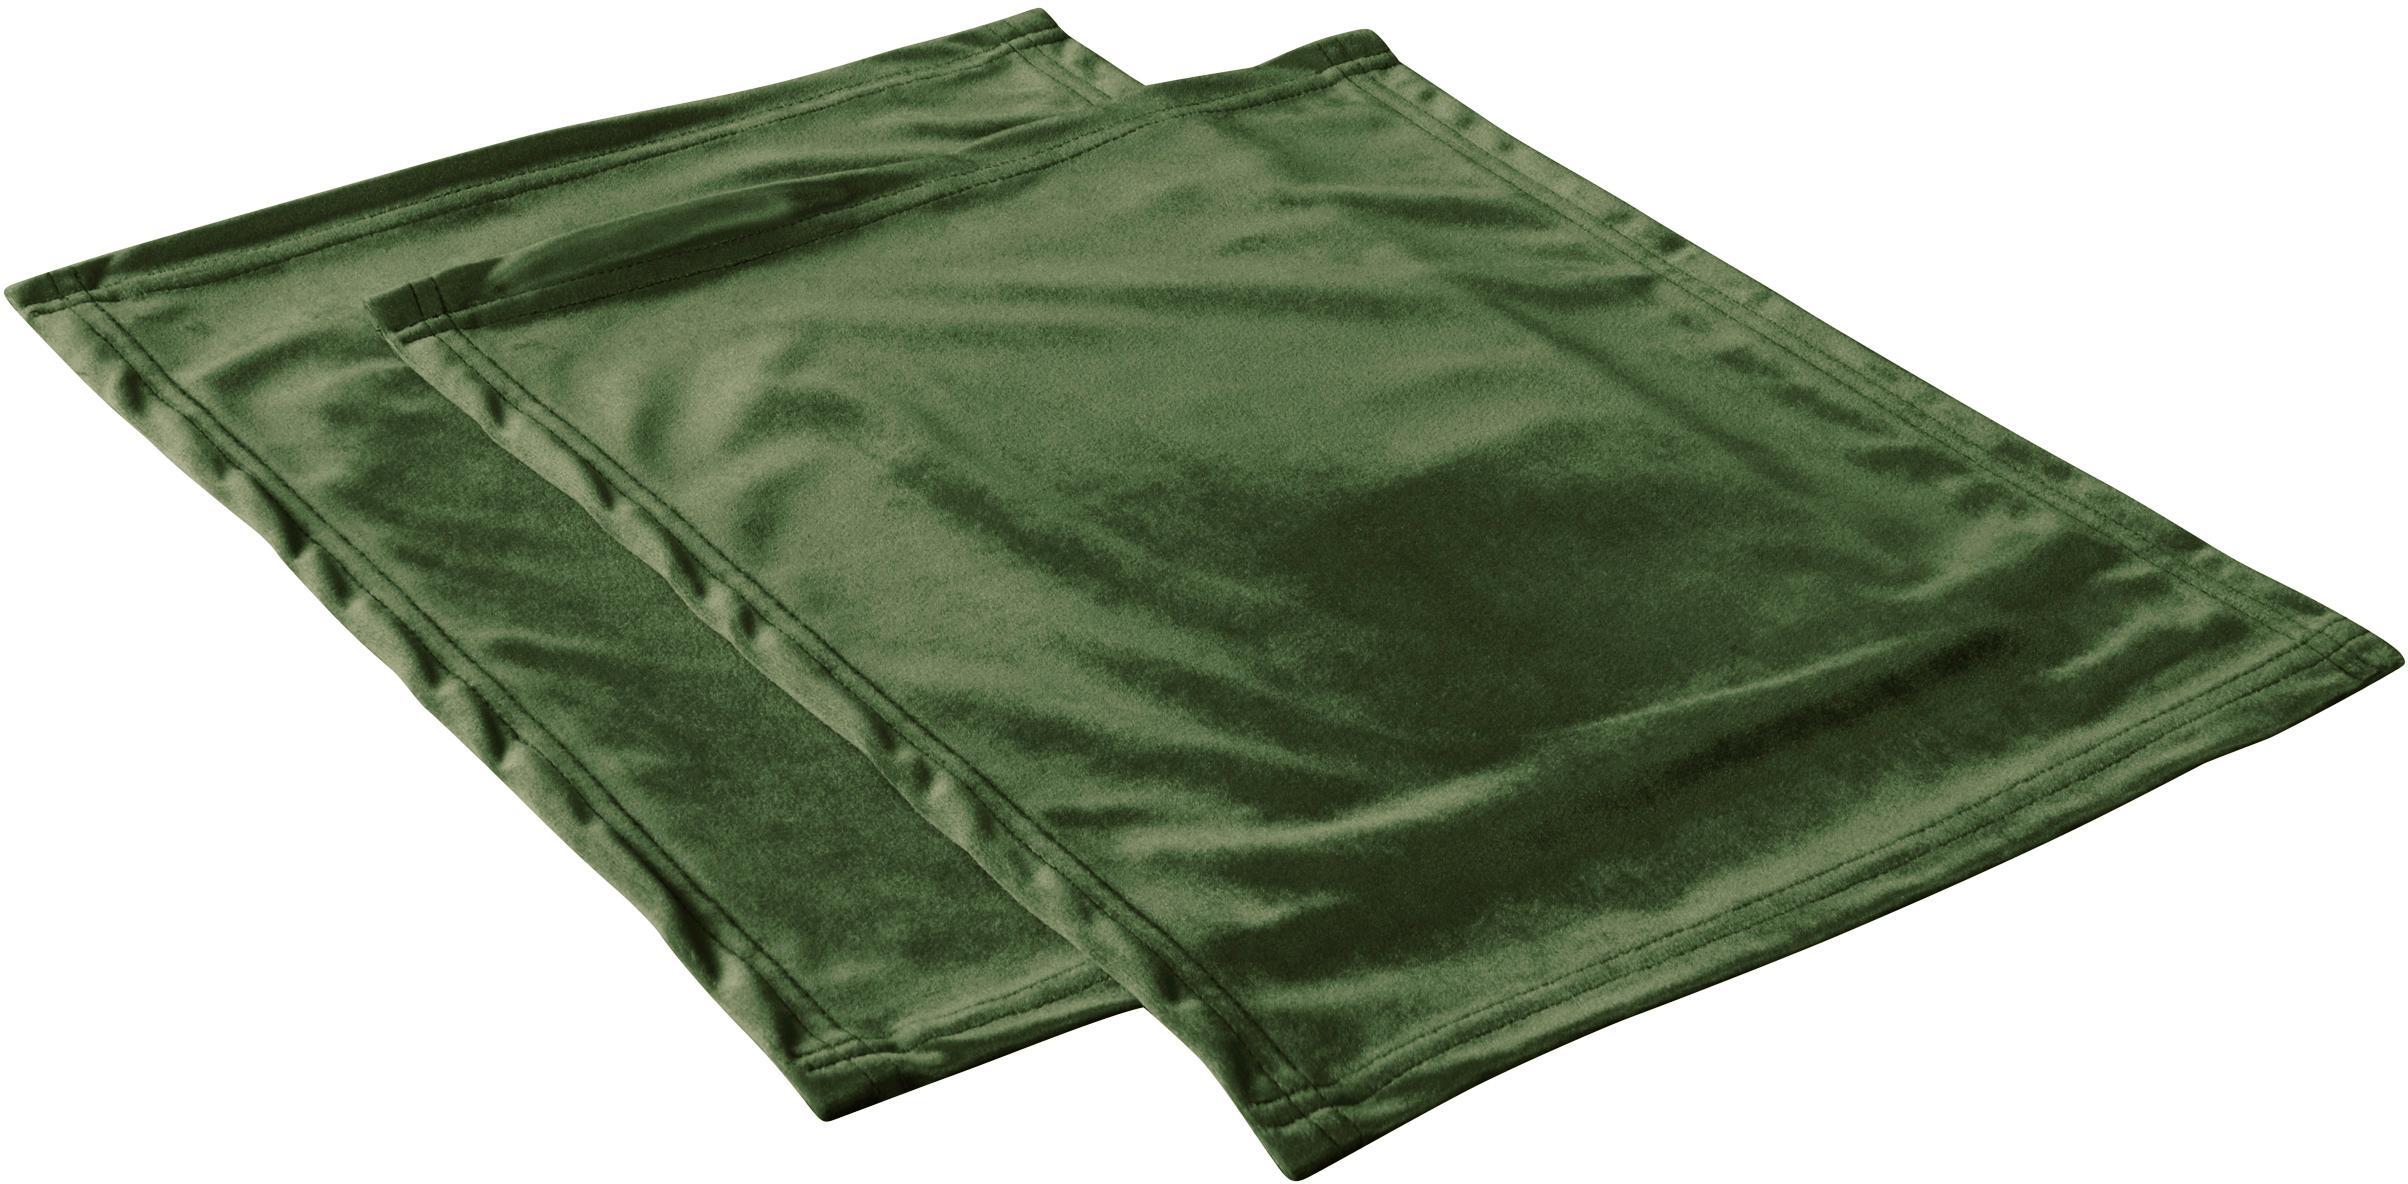 Manteles individuales de terciopelo Simone, 2uds., 100%terciopelo de poliéster, Verde oliva, An 35 x L 45 cm